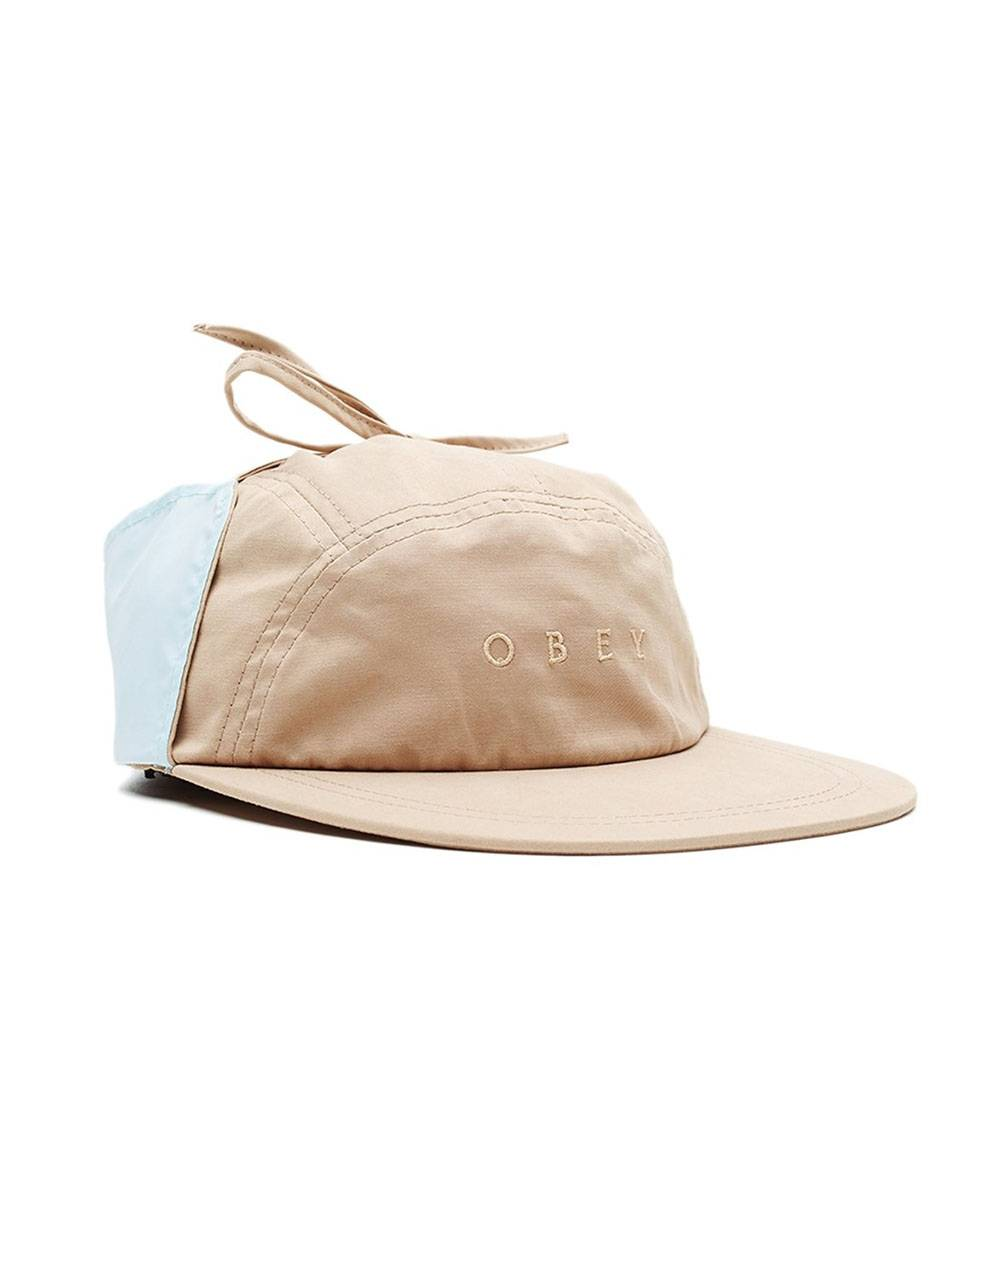 Obey shady 5 panel hat - khaki obey Hat 40,98€